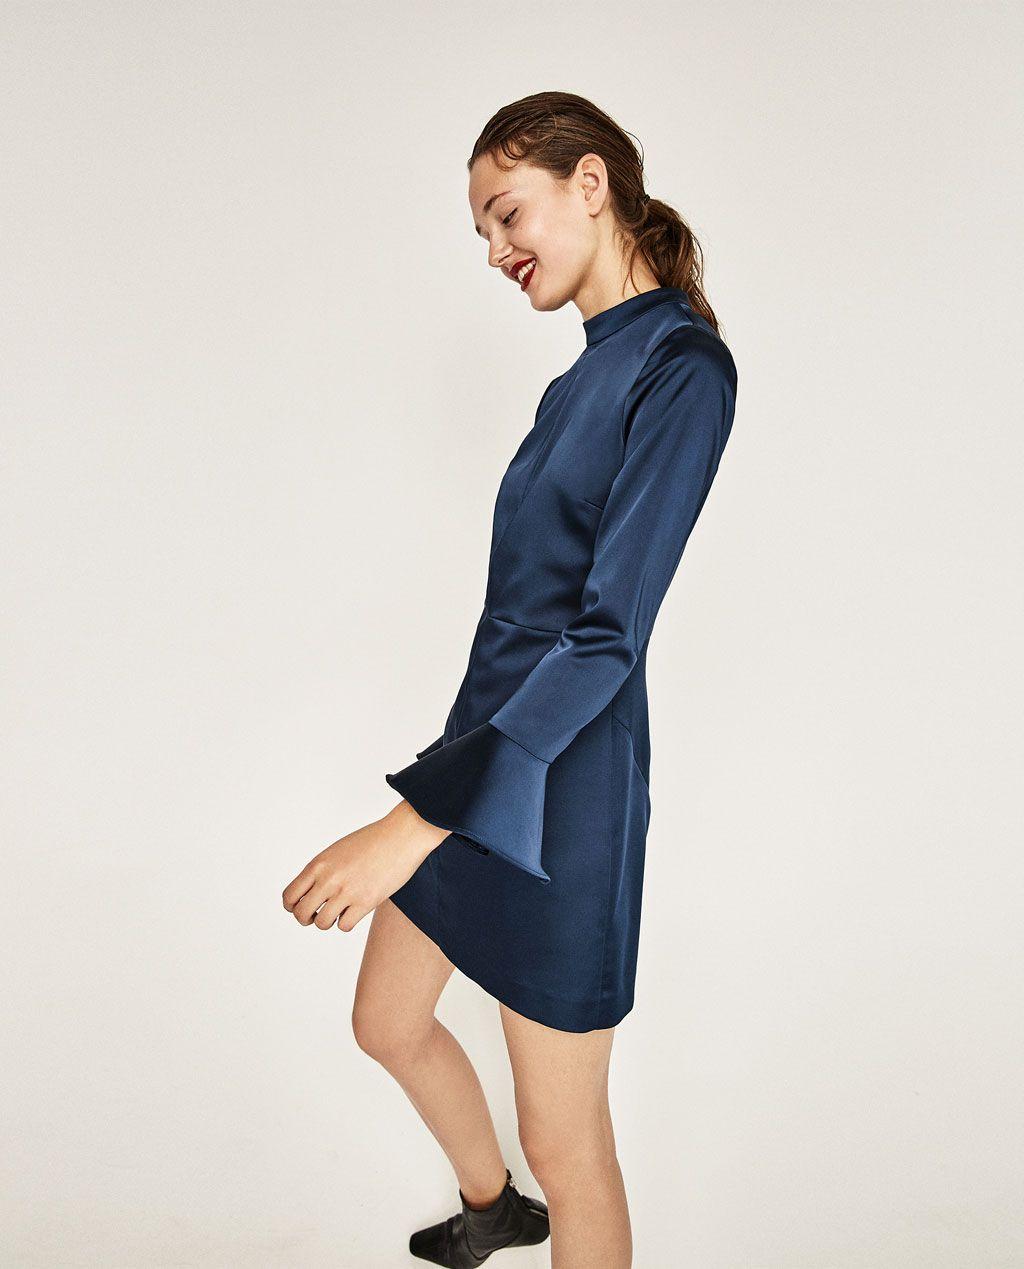 44ff4c8b5 ZARA - WOMAN - SATEEN OPEN BACK DRESS | clothes | Dresses, Open back ...